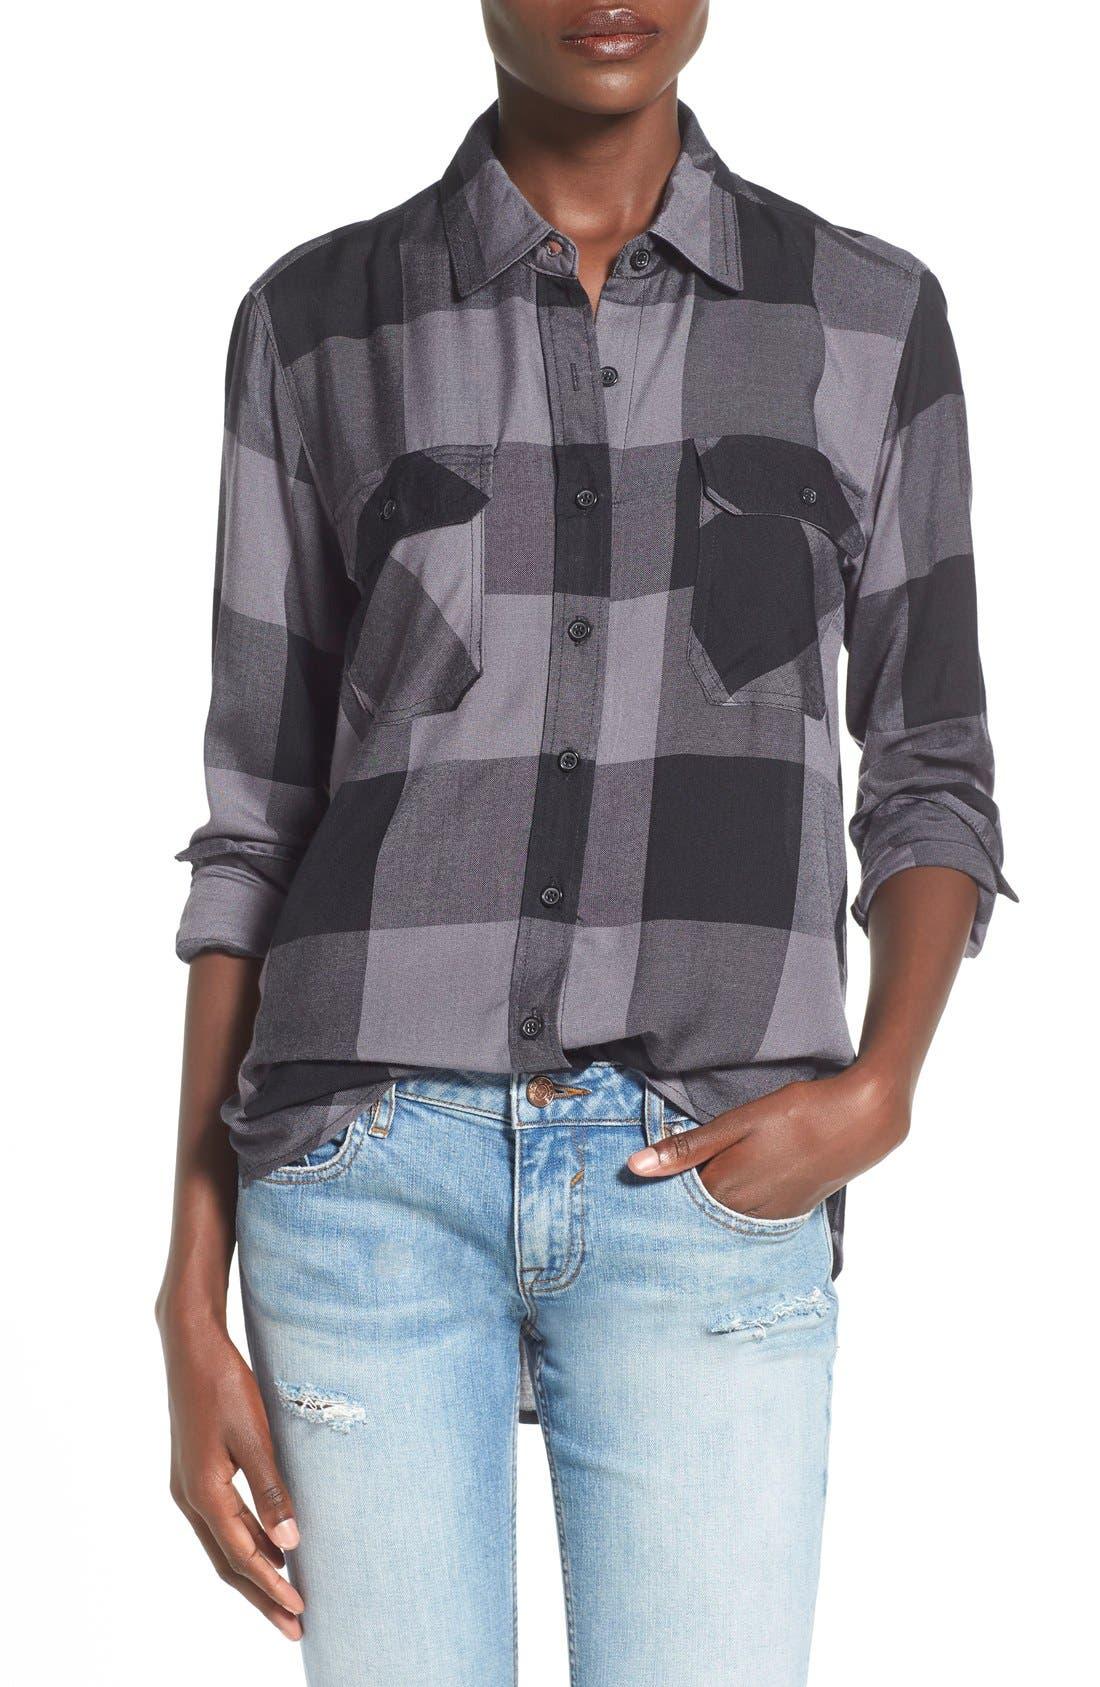 Alternate Image 1 Selected - Thread & Supply 'Huntington Beach' Check Shirt